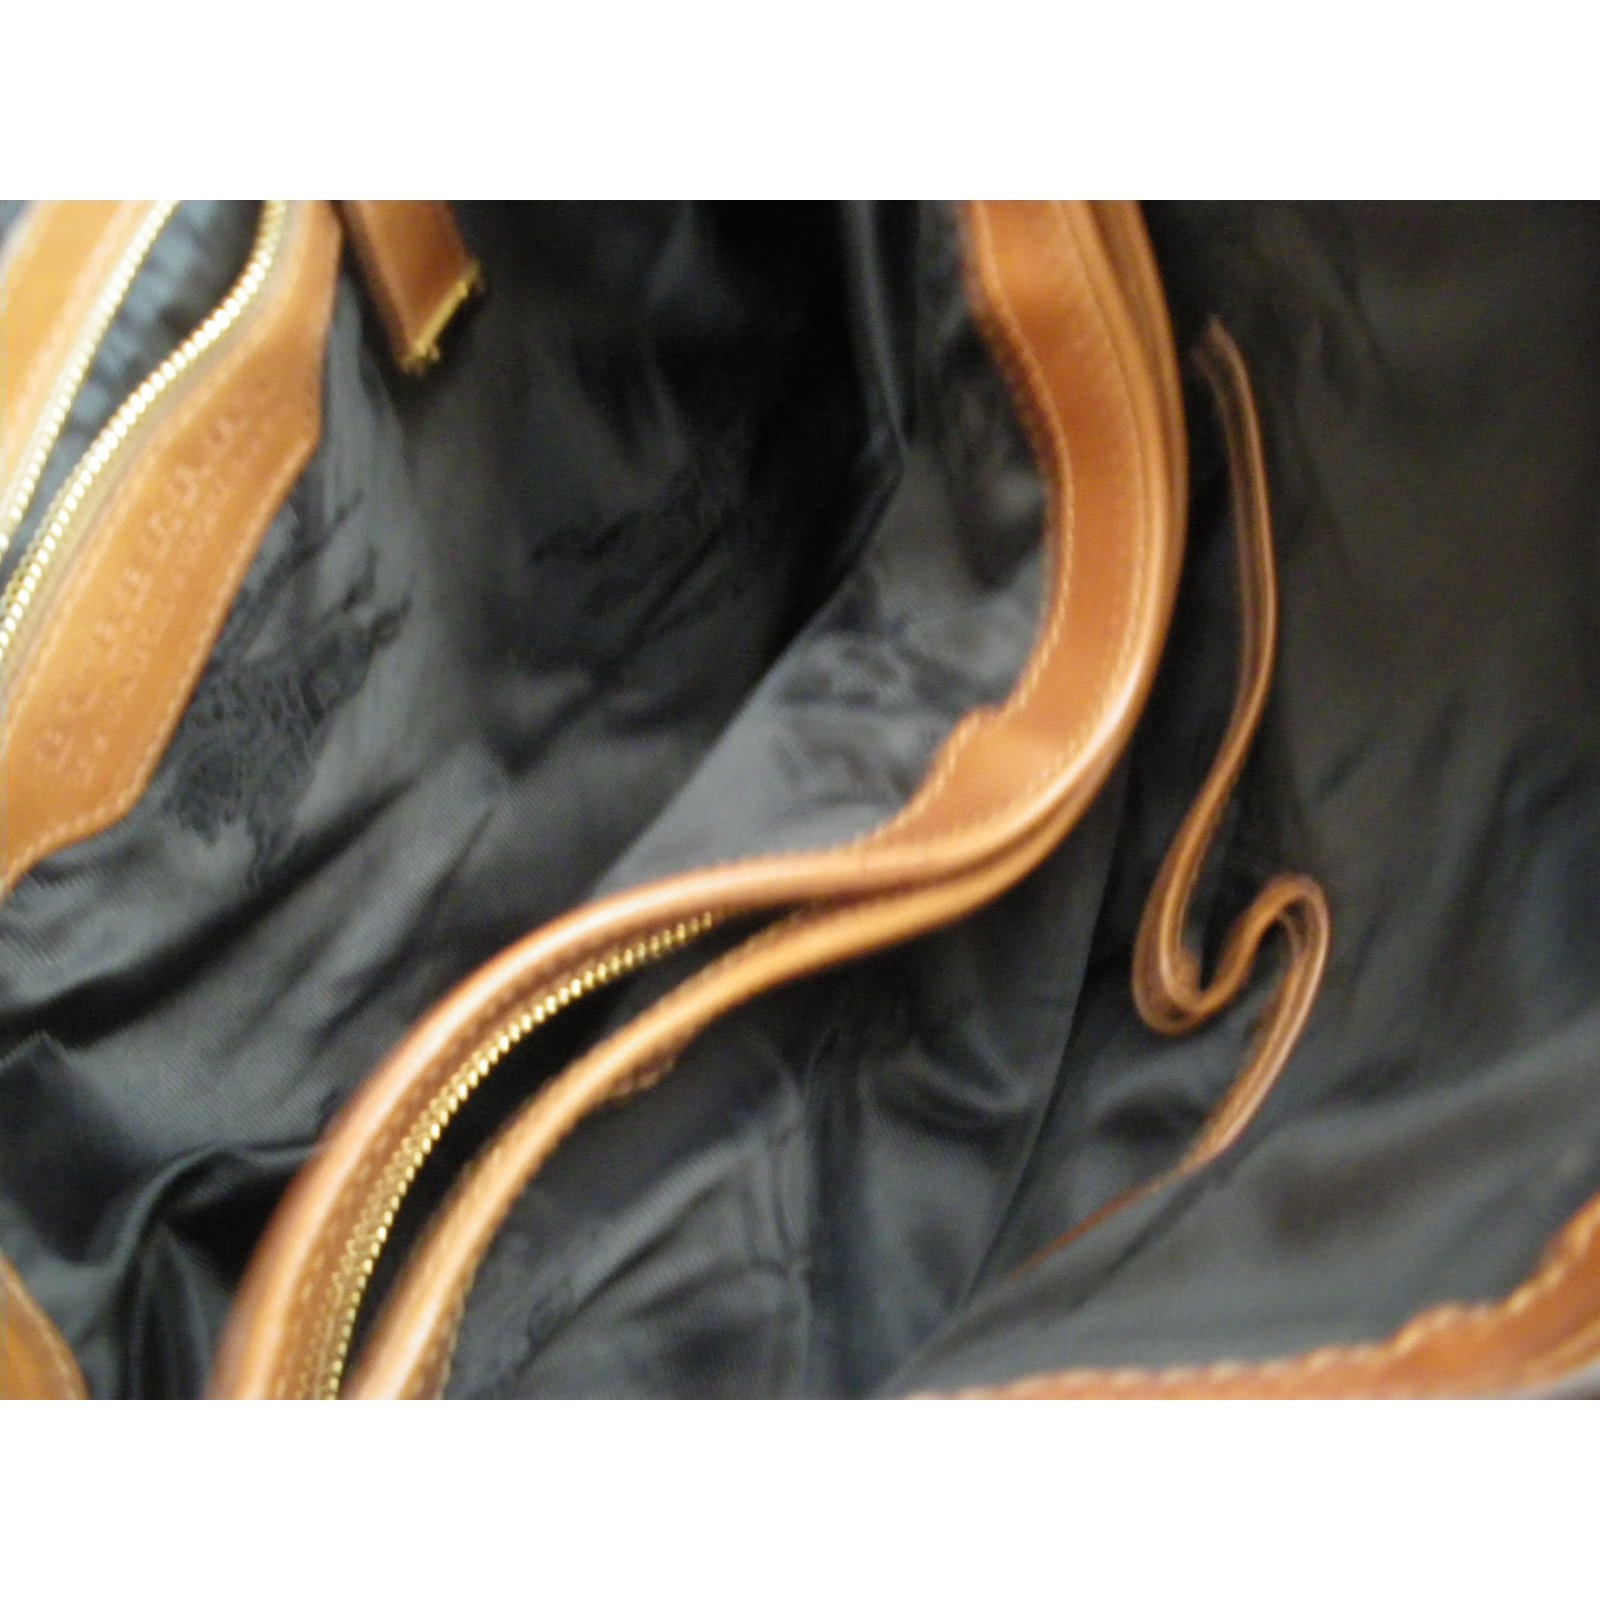 Facebook · Pin This. Burberry Handbags Handbags Leather Brown ref.64275 247b944893